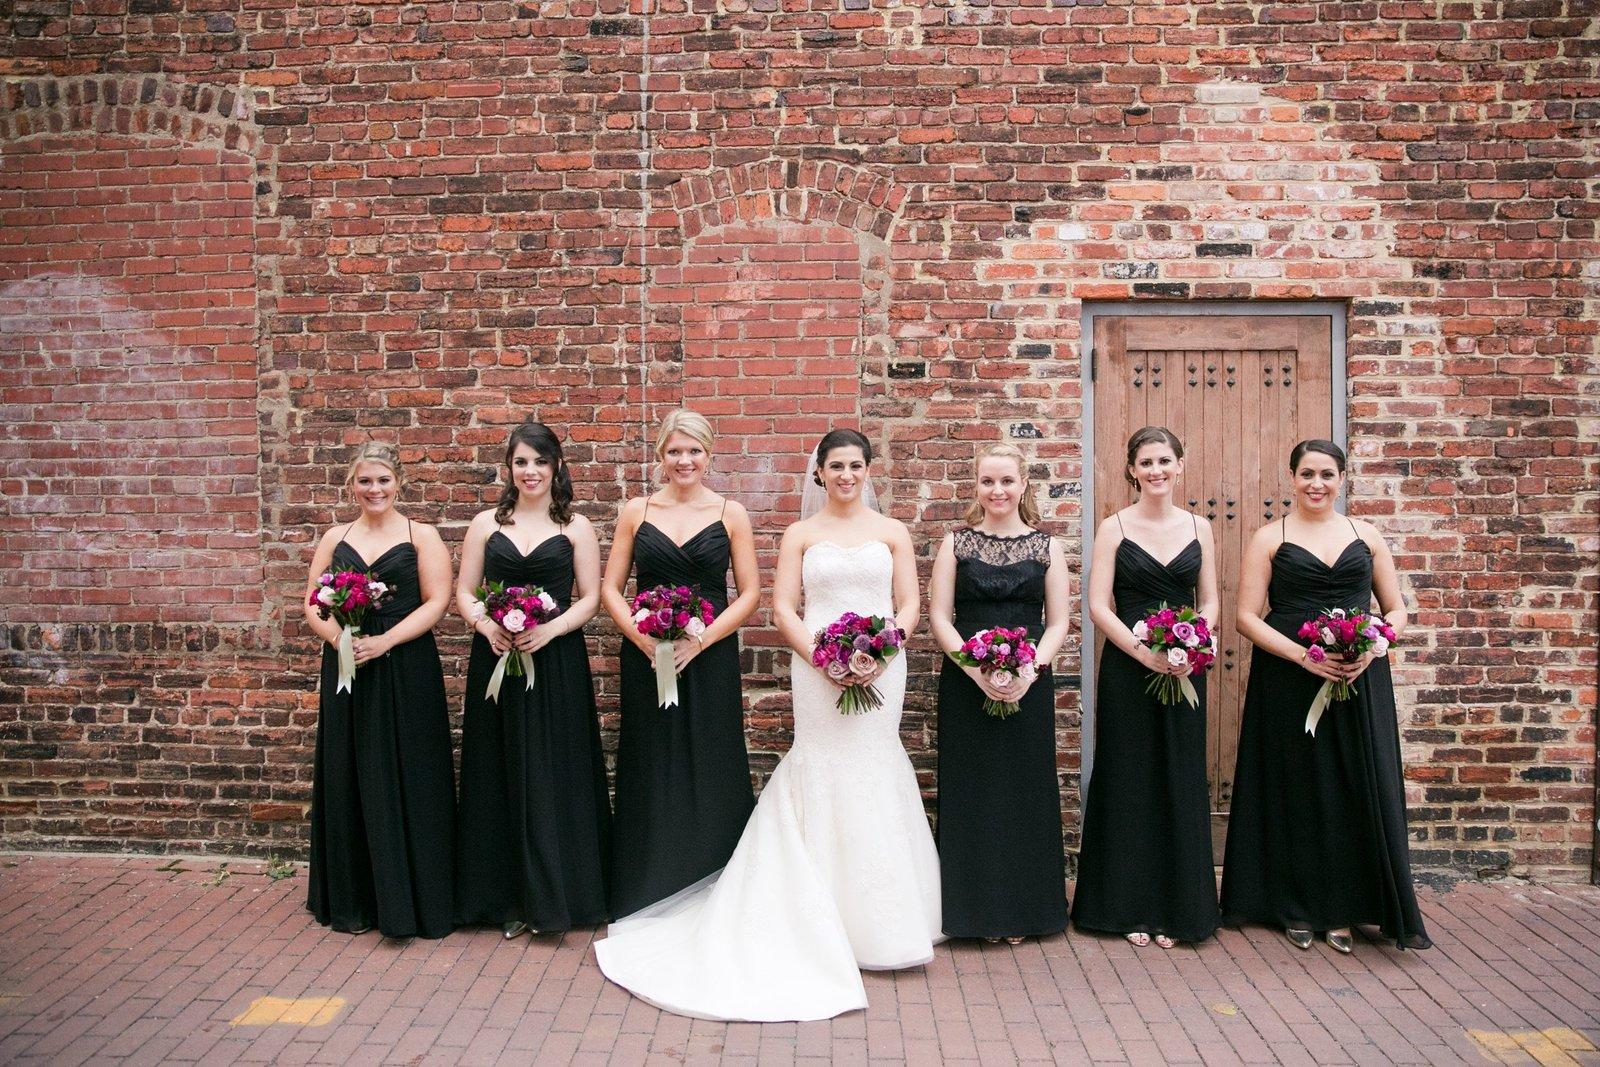 Black-tie-wedding-photos-longview-gallery-dc (159)